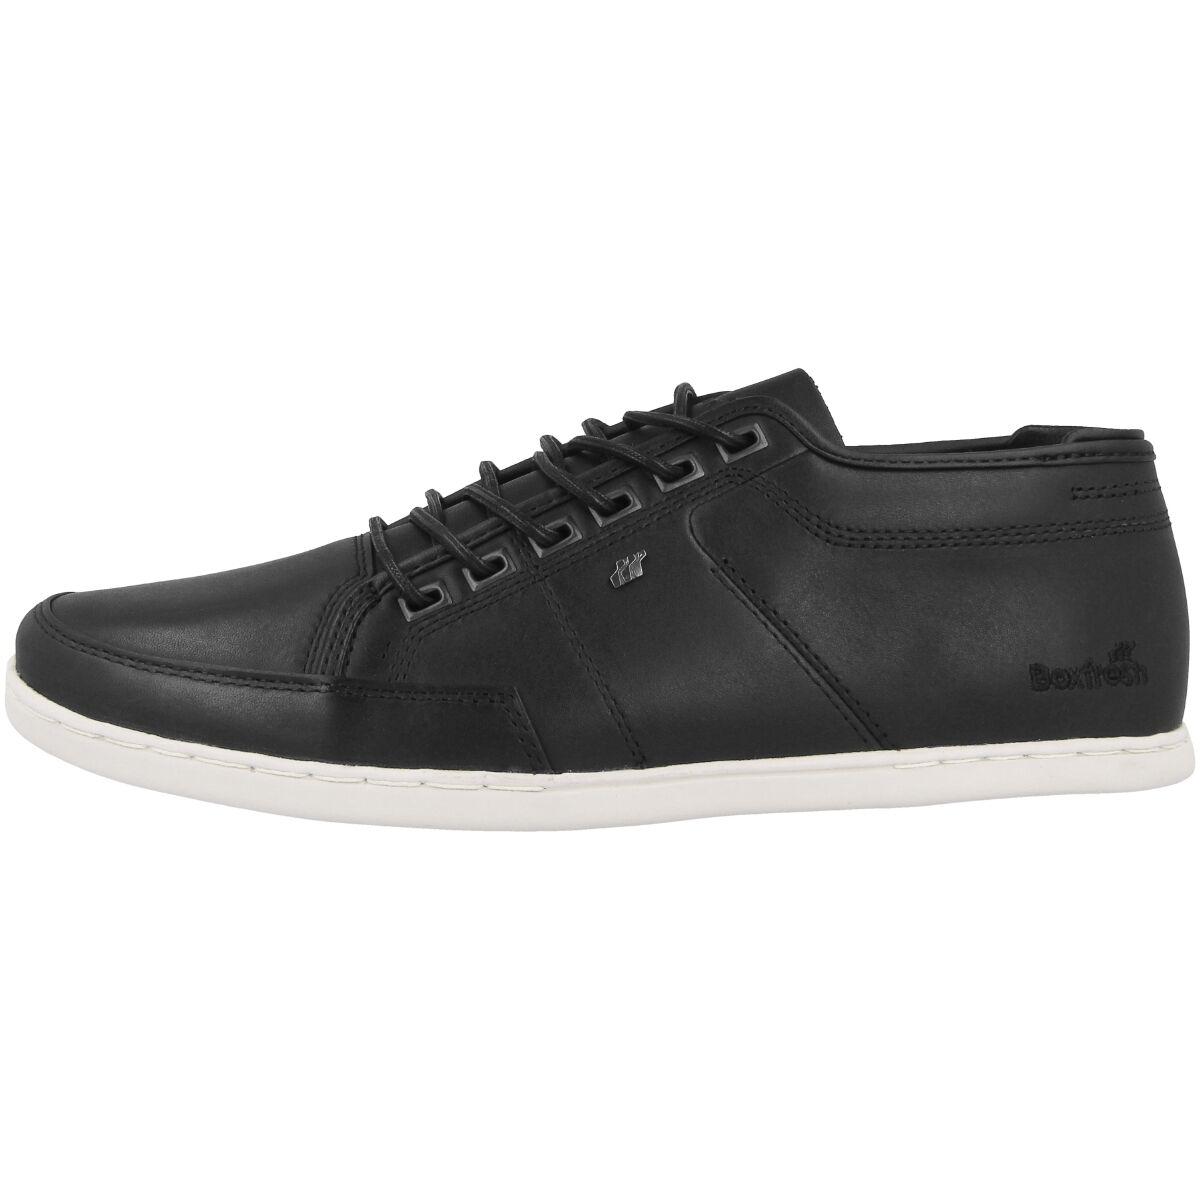 Boxfresh Sparko Premium ICN Zambia Leather Sneaker Leder Schuhe black E15240